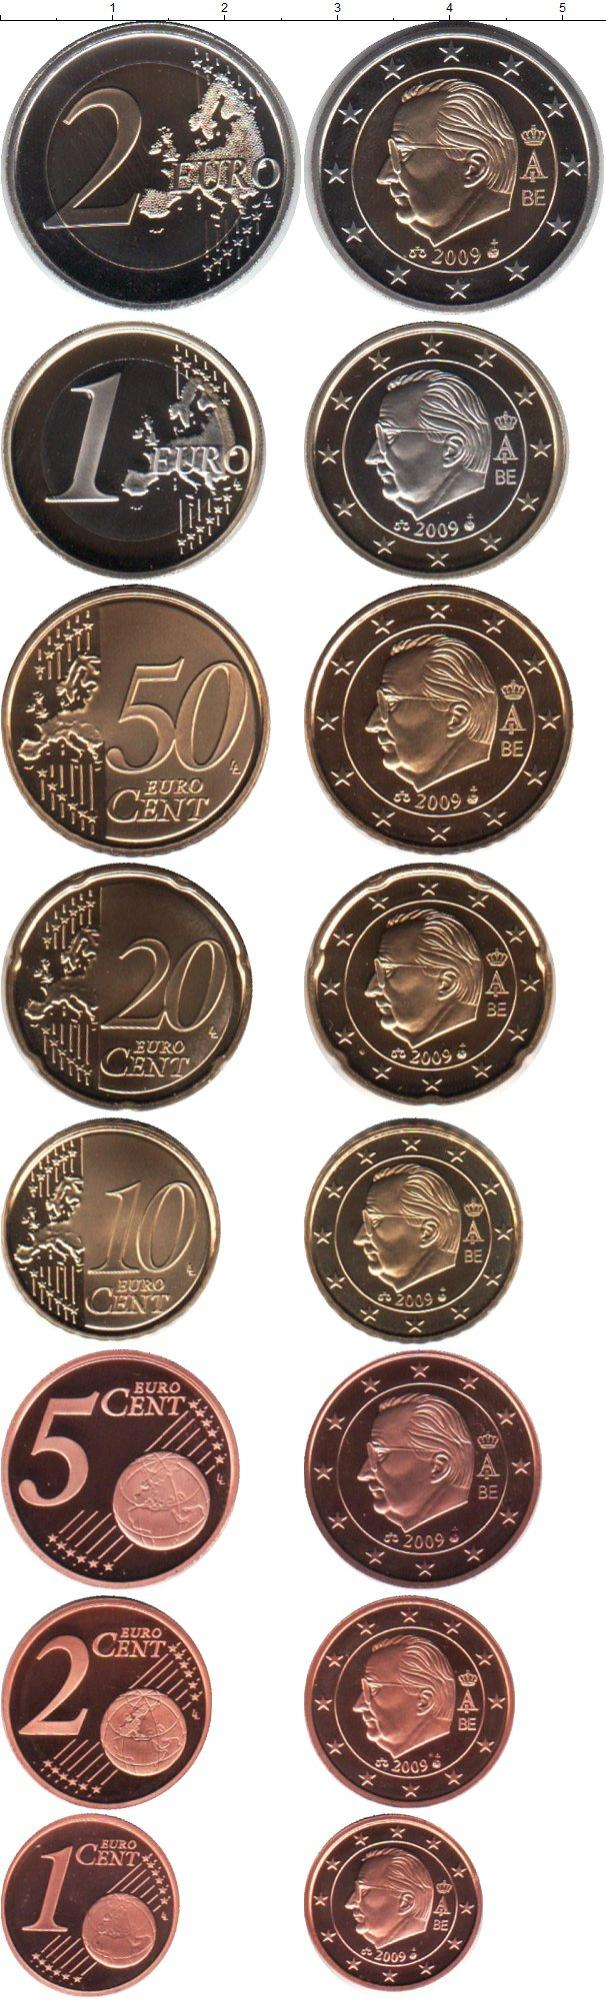 Каталог монет - Бельгия Евронабор 2009 года